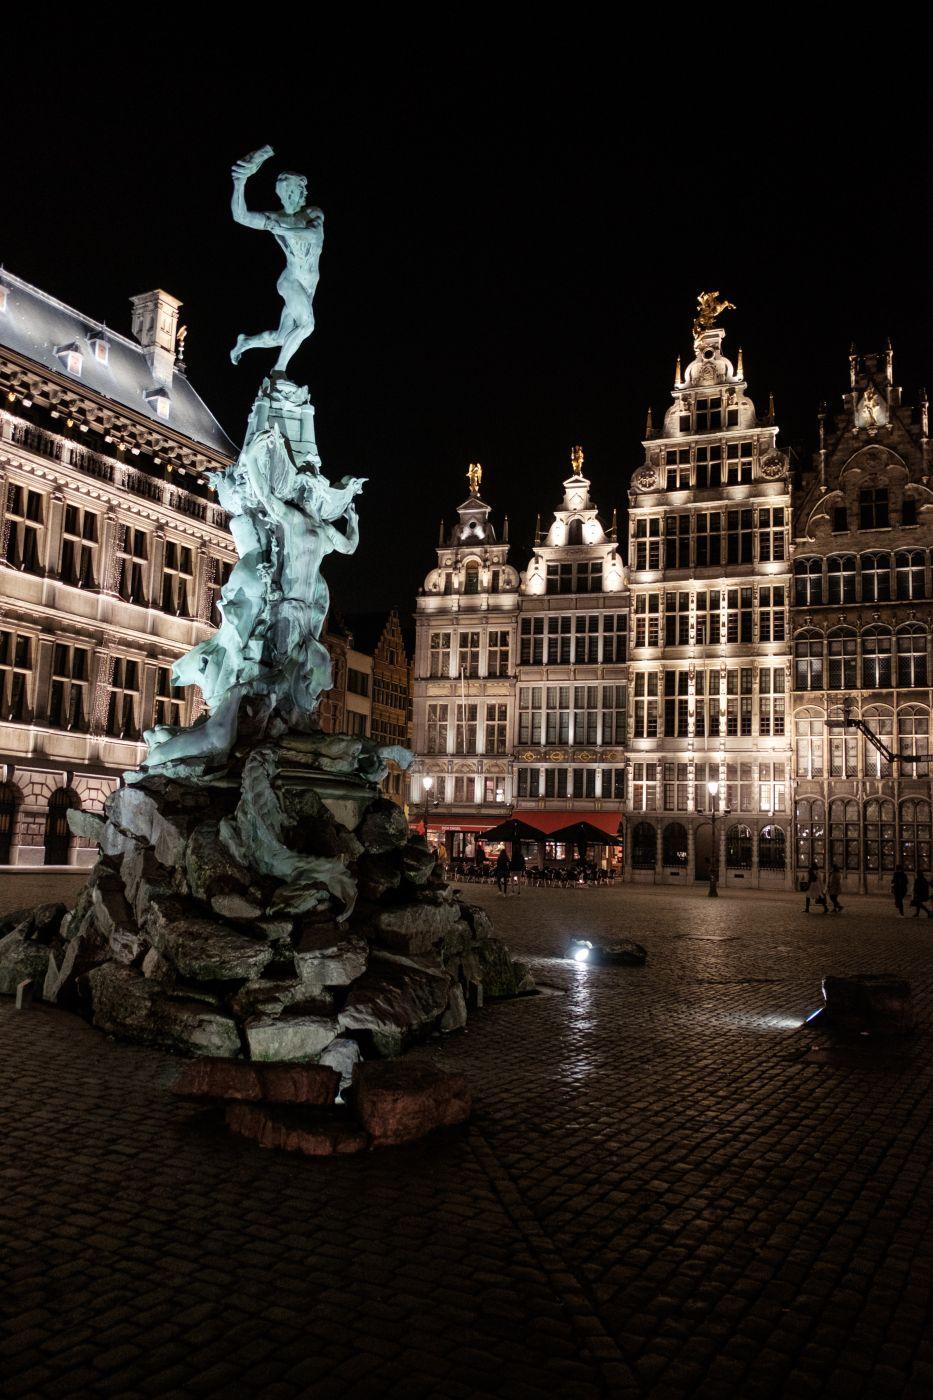 Antwerpen Grote Markt (Town square), Belgium